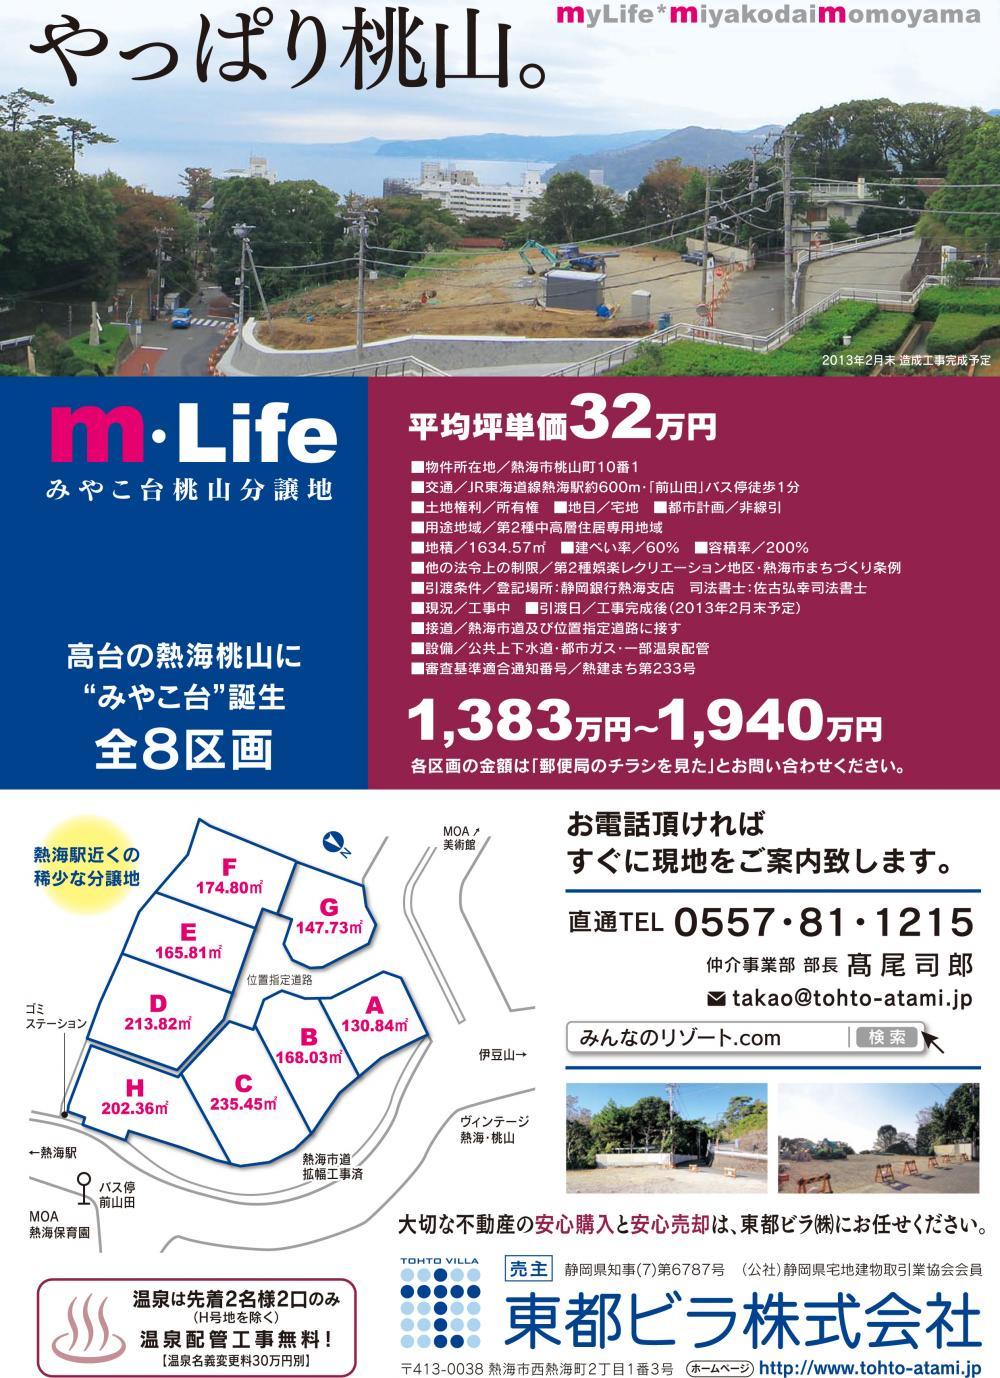 miyakodaimomoyama4.jpg